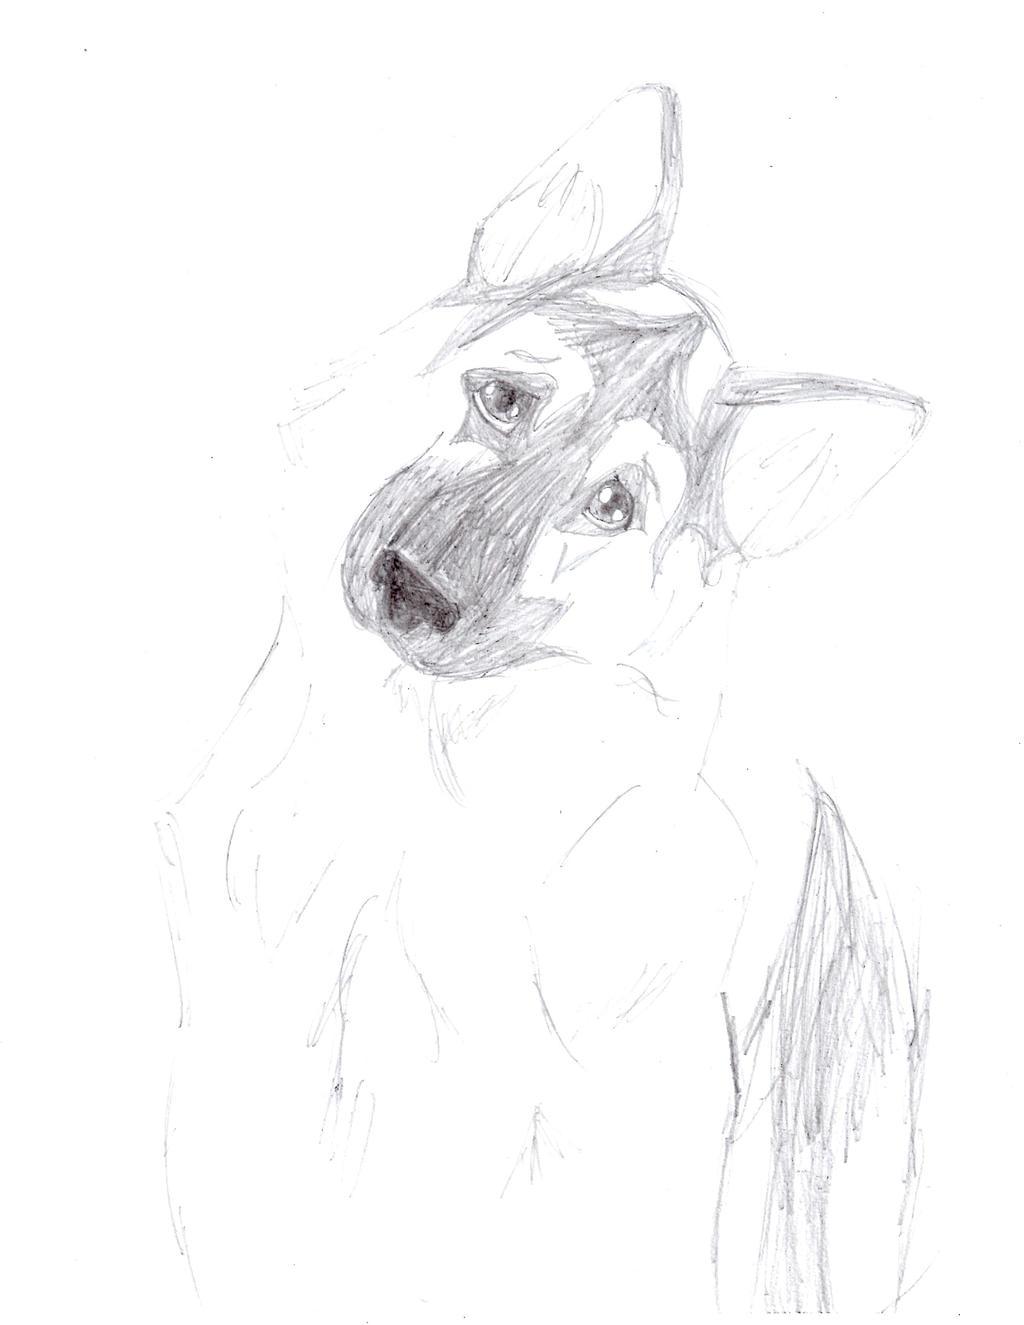 Confused German Shepherd by FieryCreator on DeviantArt